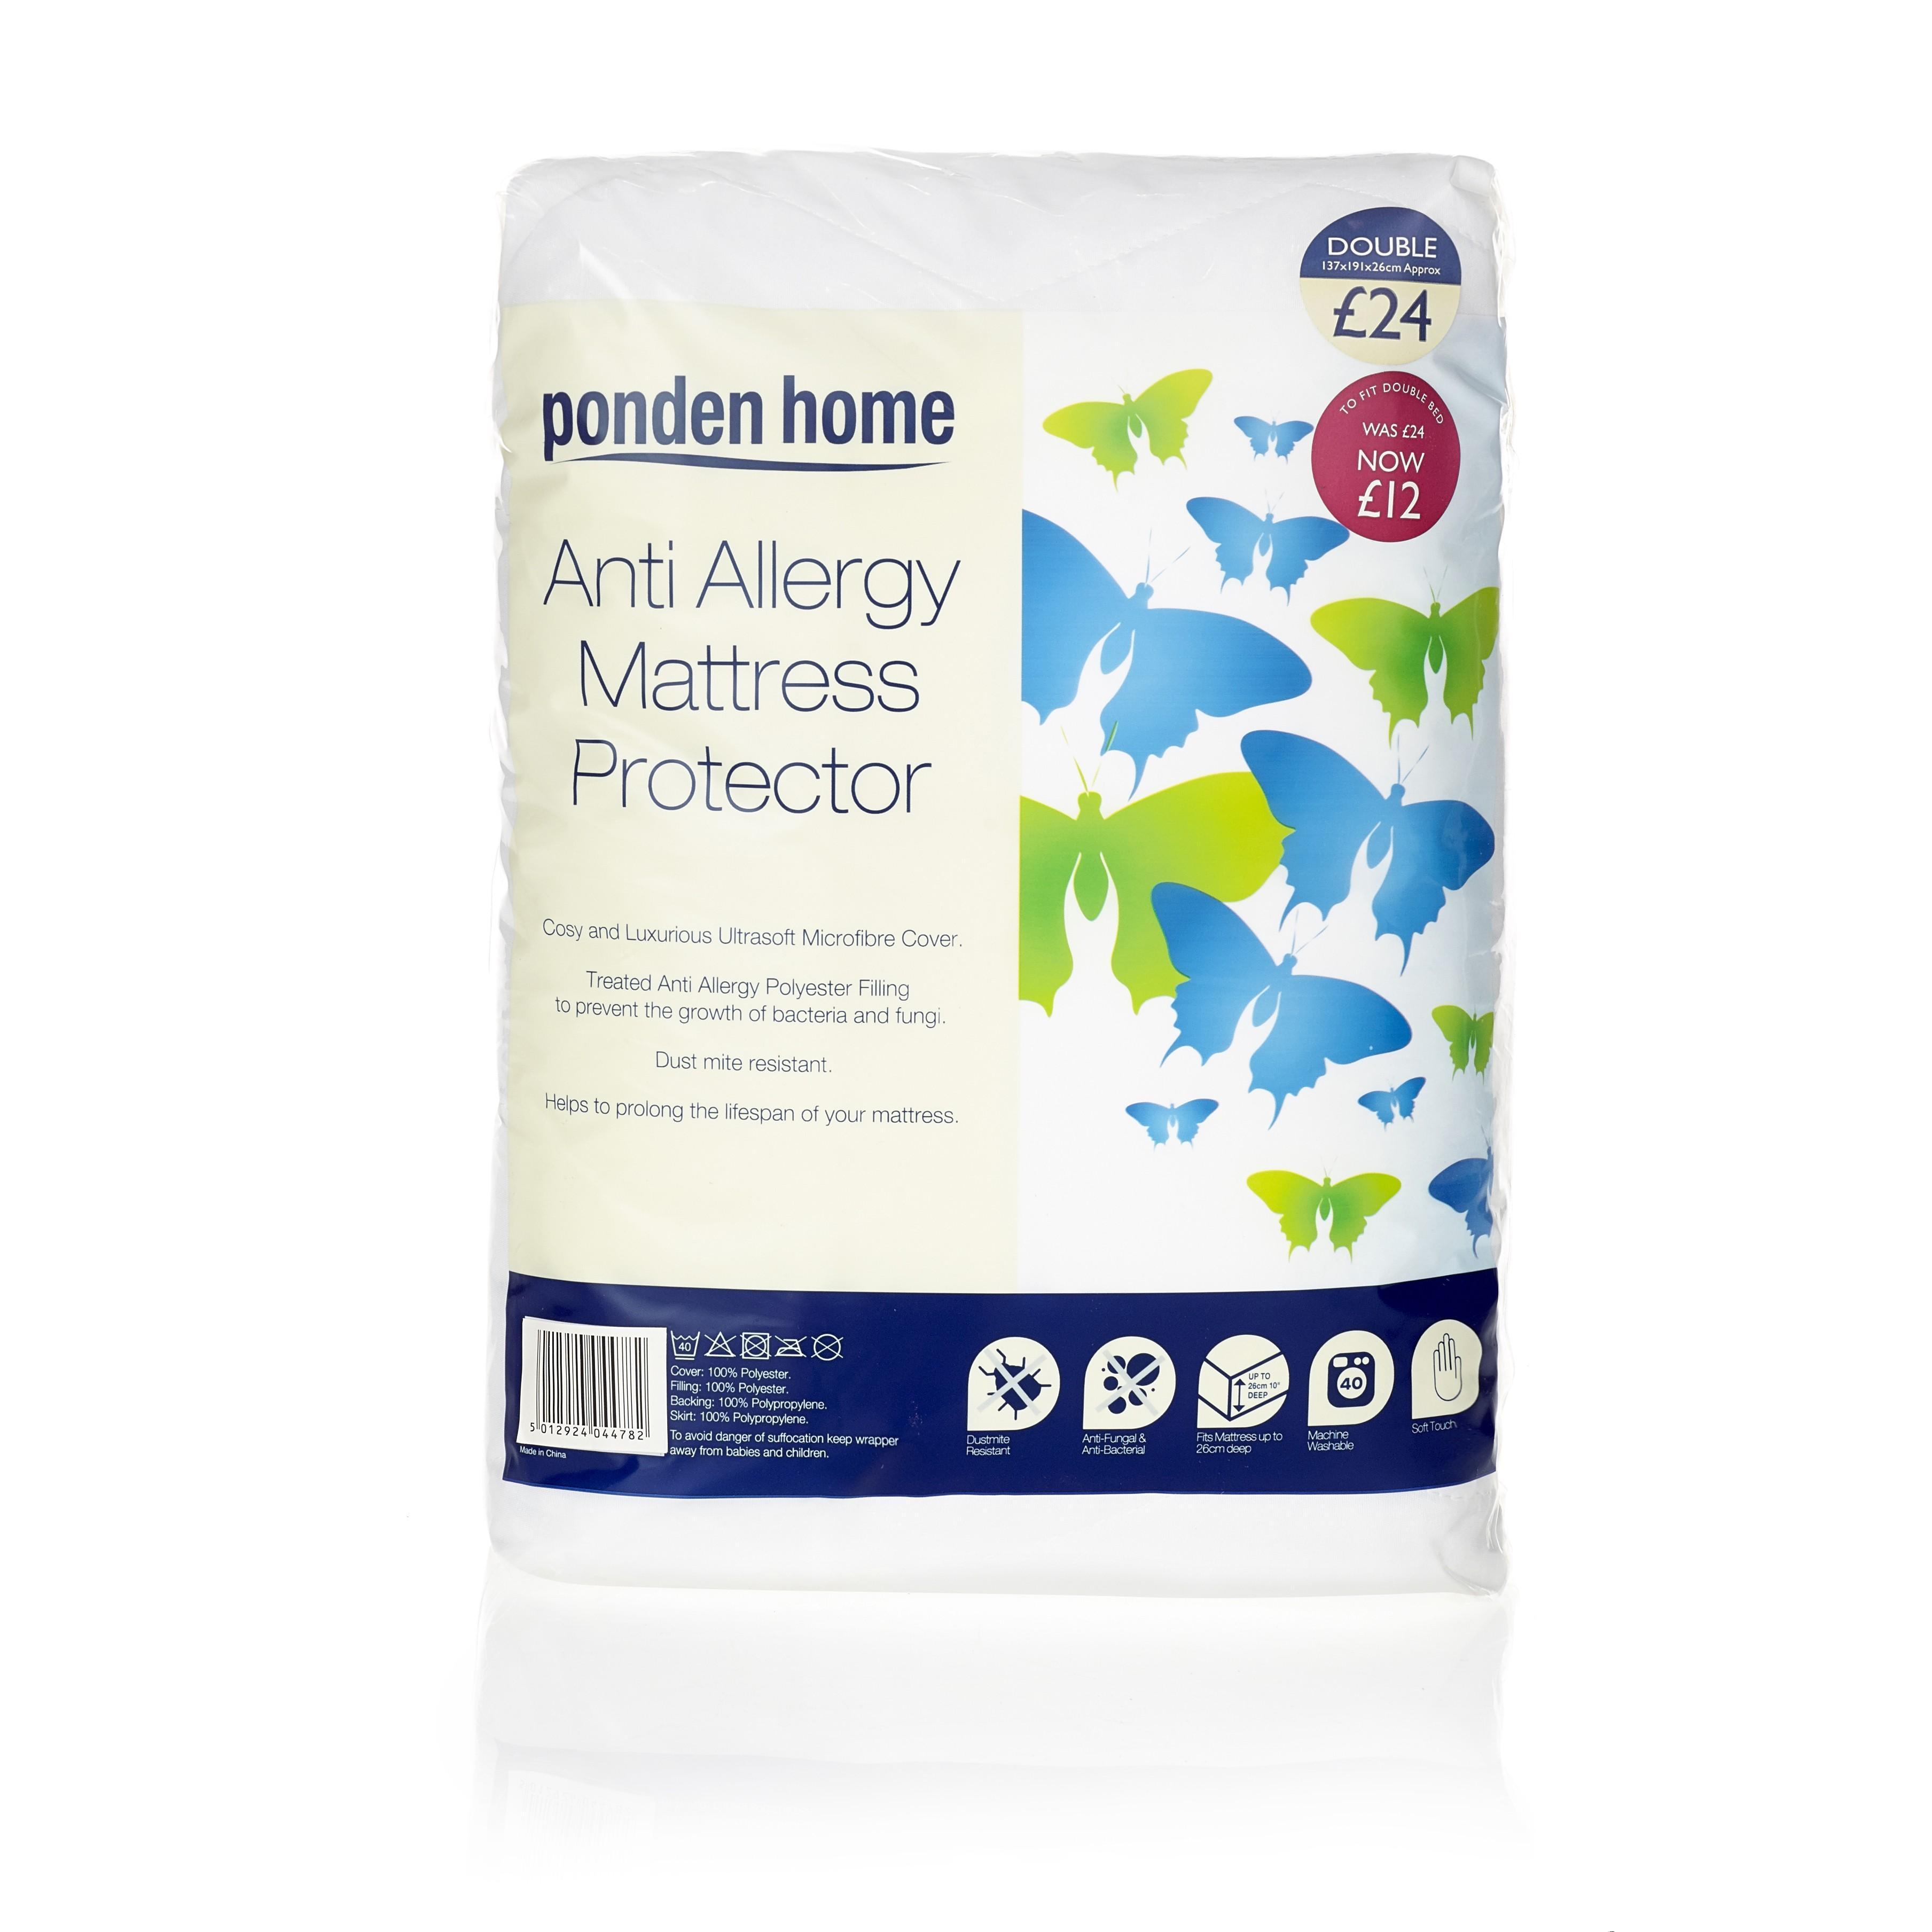 Anti Allergy Mattress Protector Ponden Home